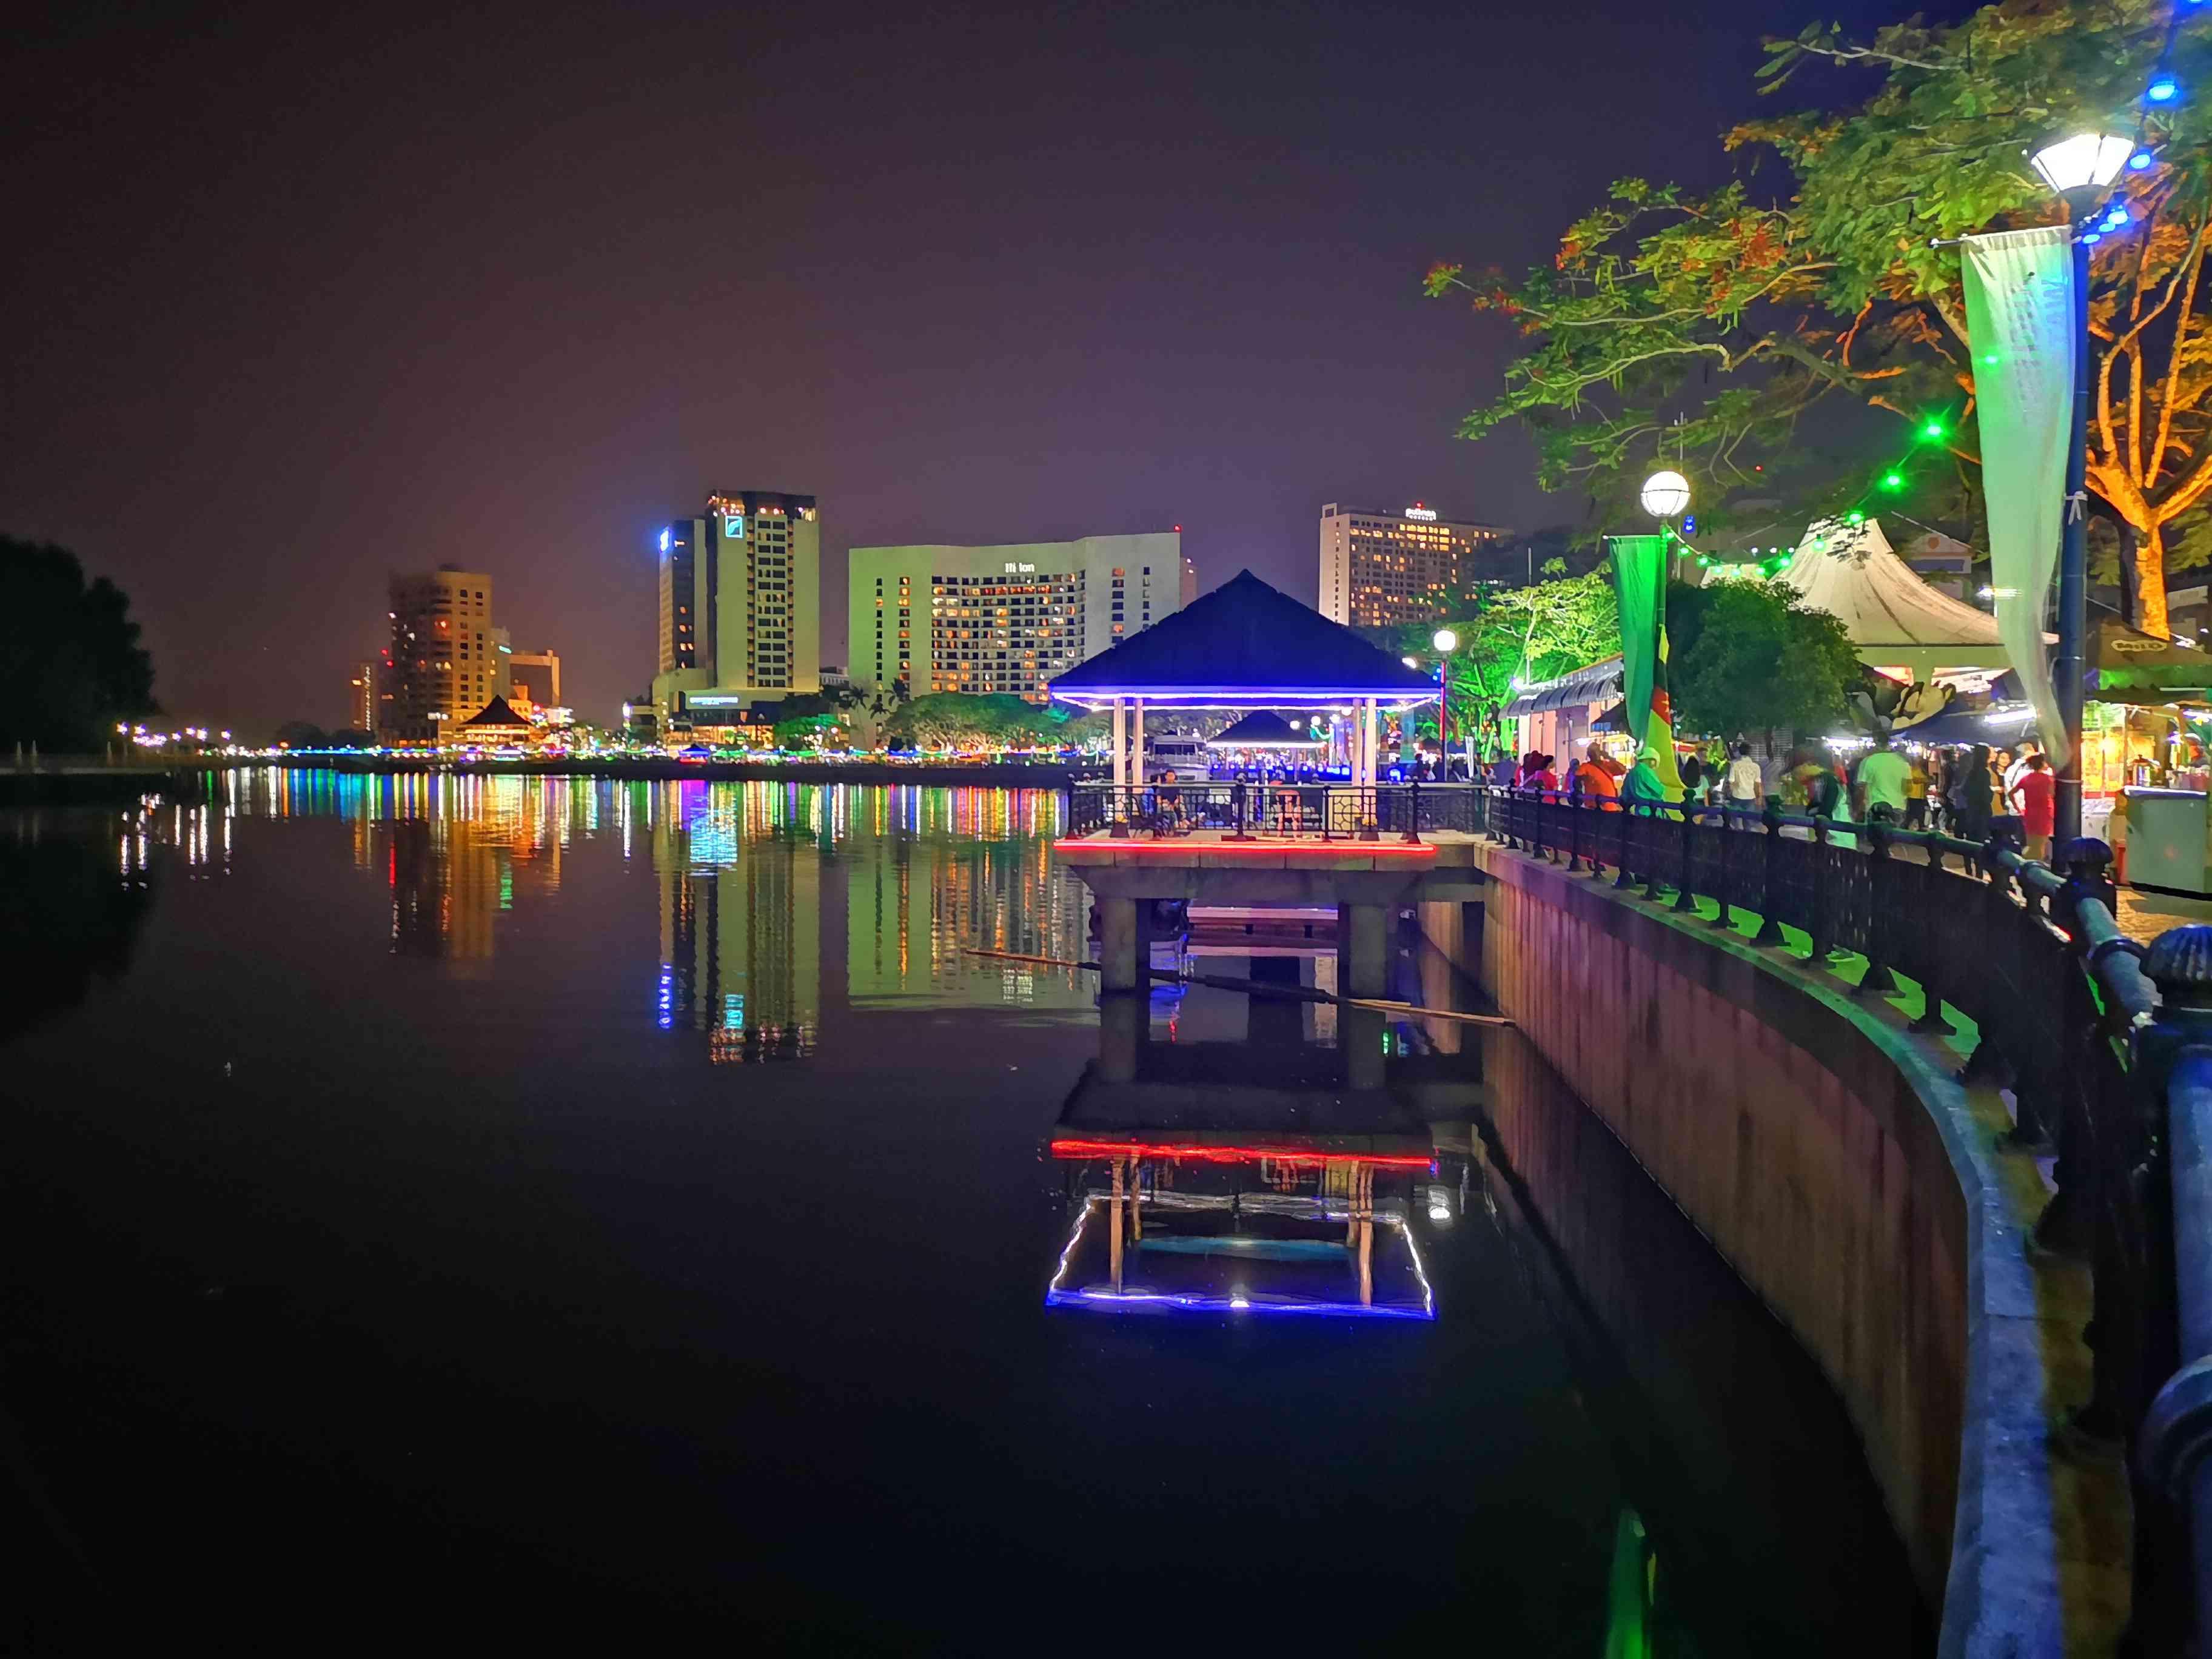 Riverfront walk lit up at night in Kuching, Sarawak, Borneo